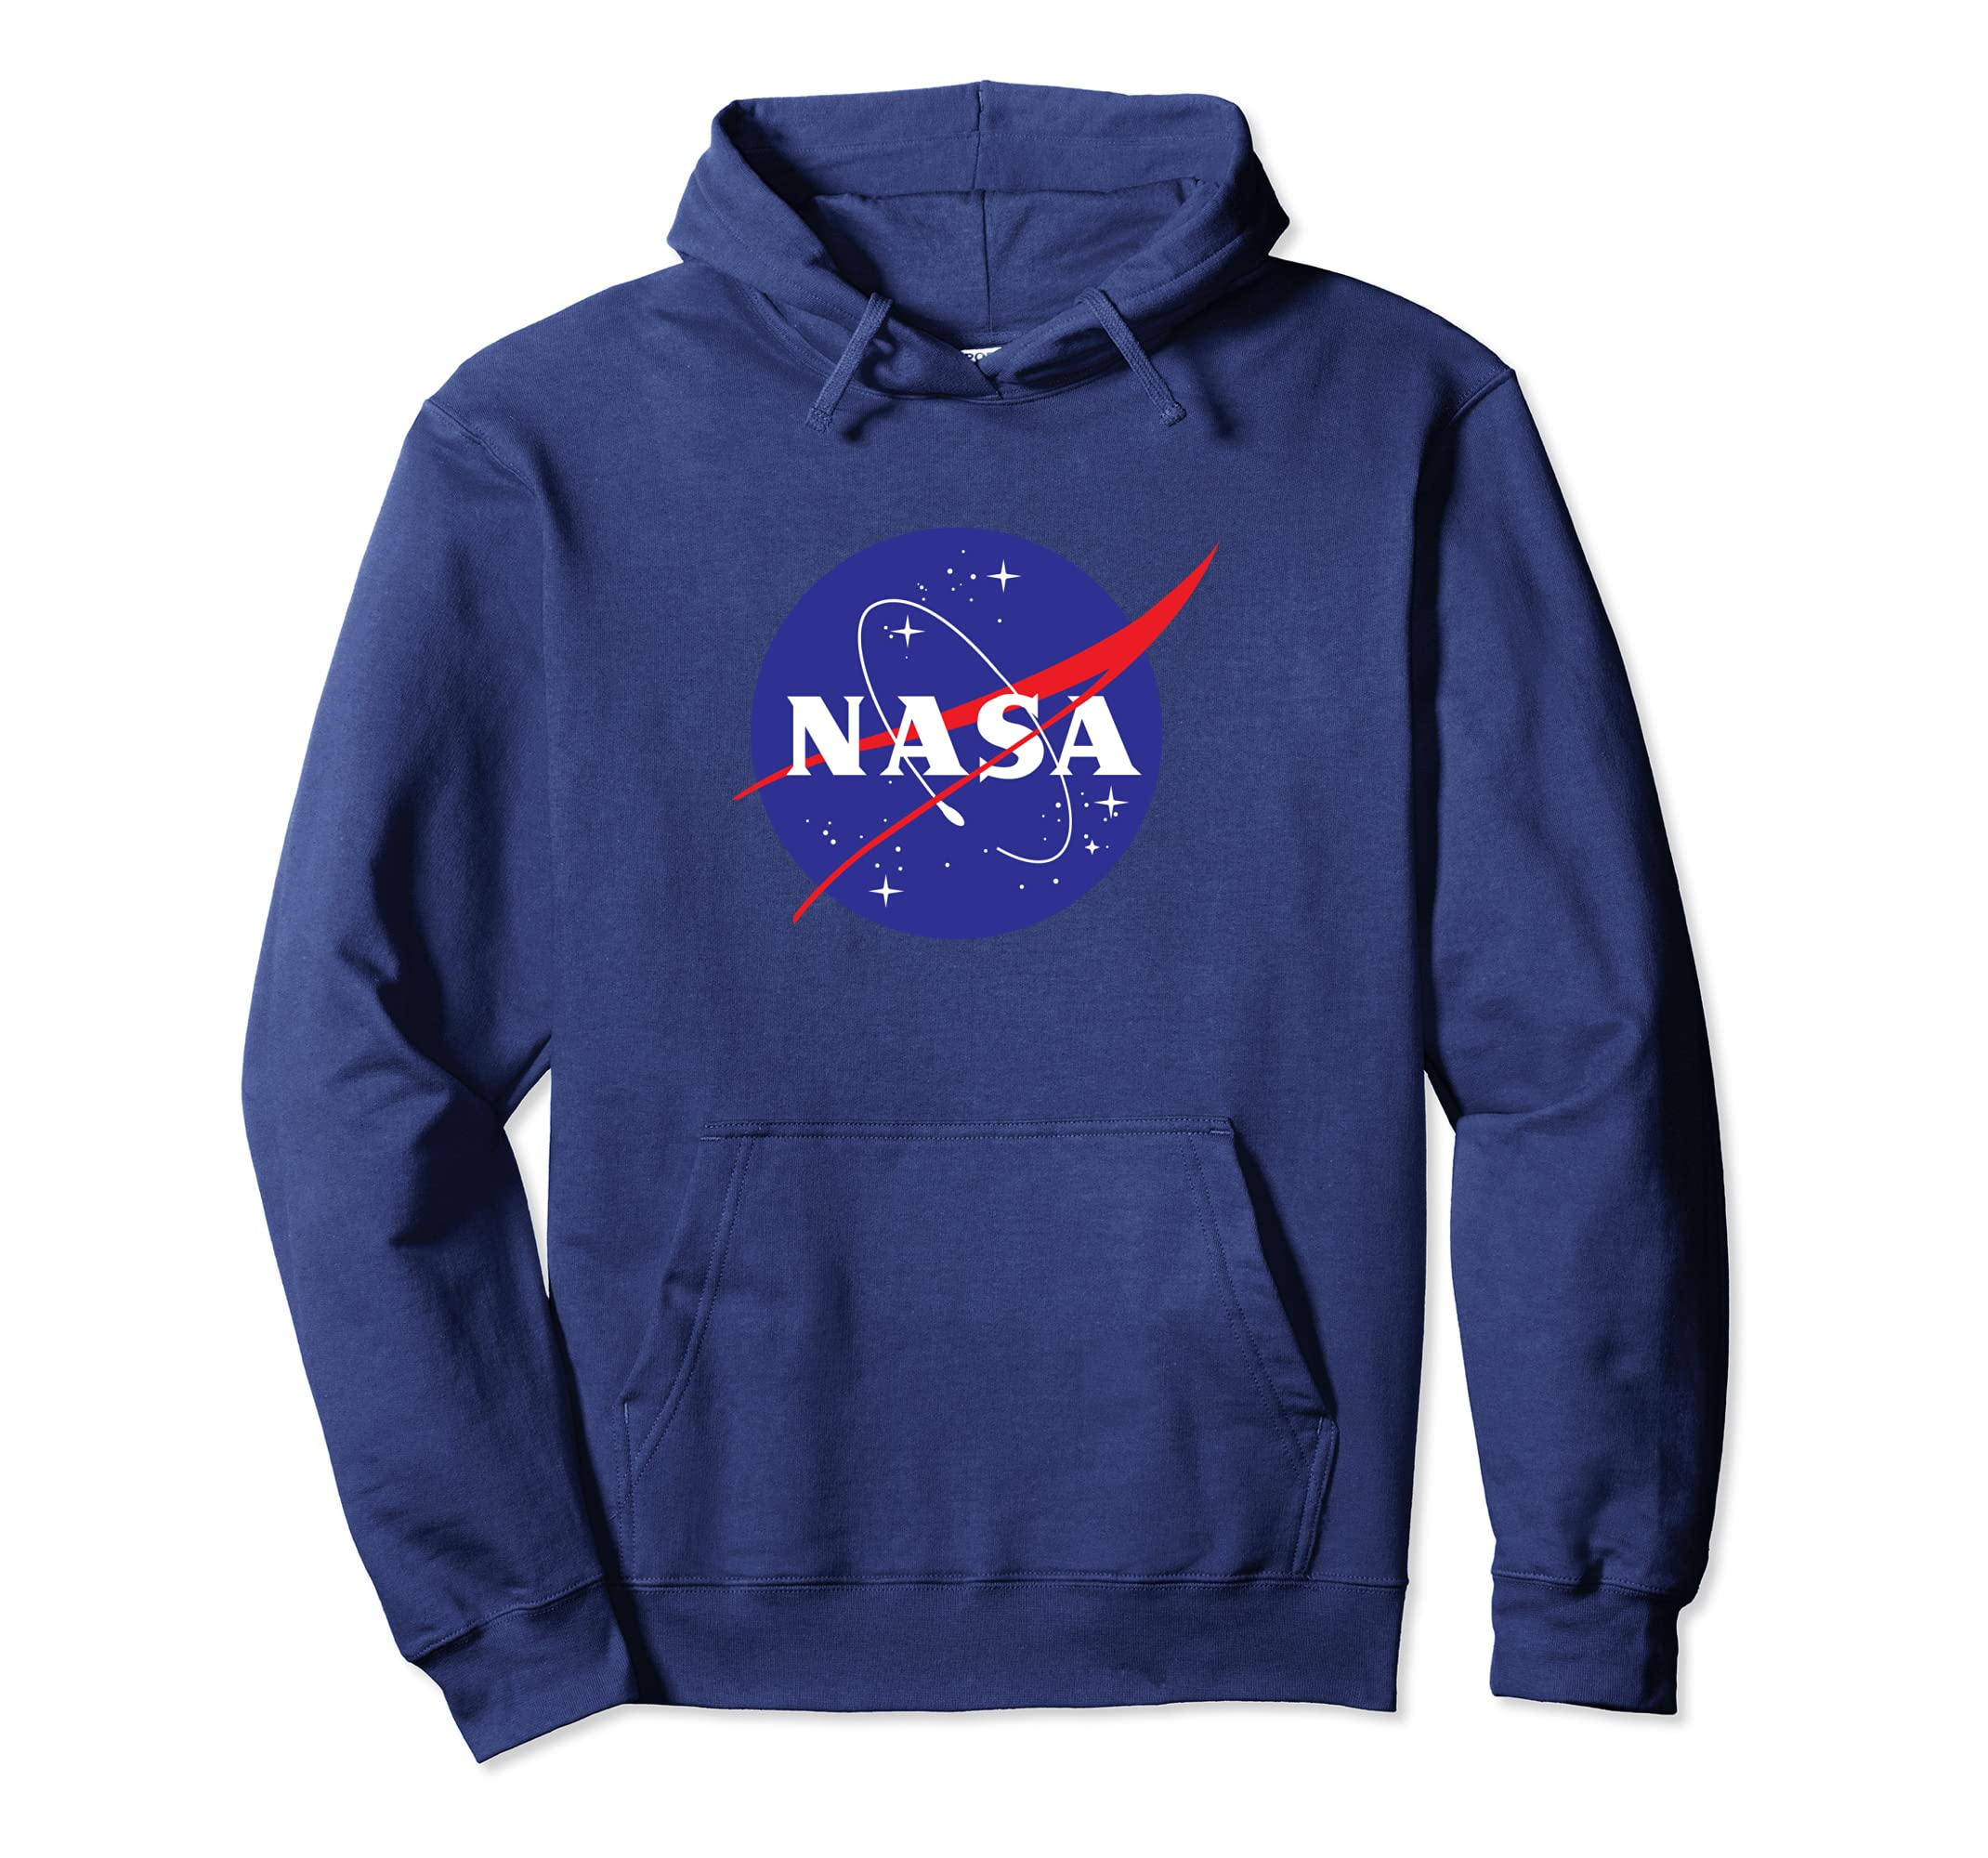 308d90705 Amazon.com: NASA Pullover Hoodie: Clothing